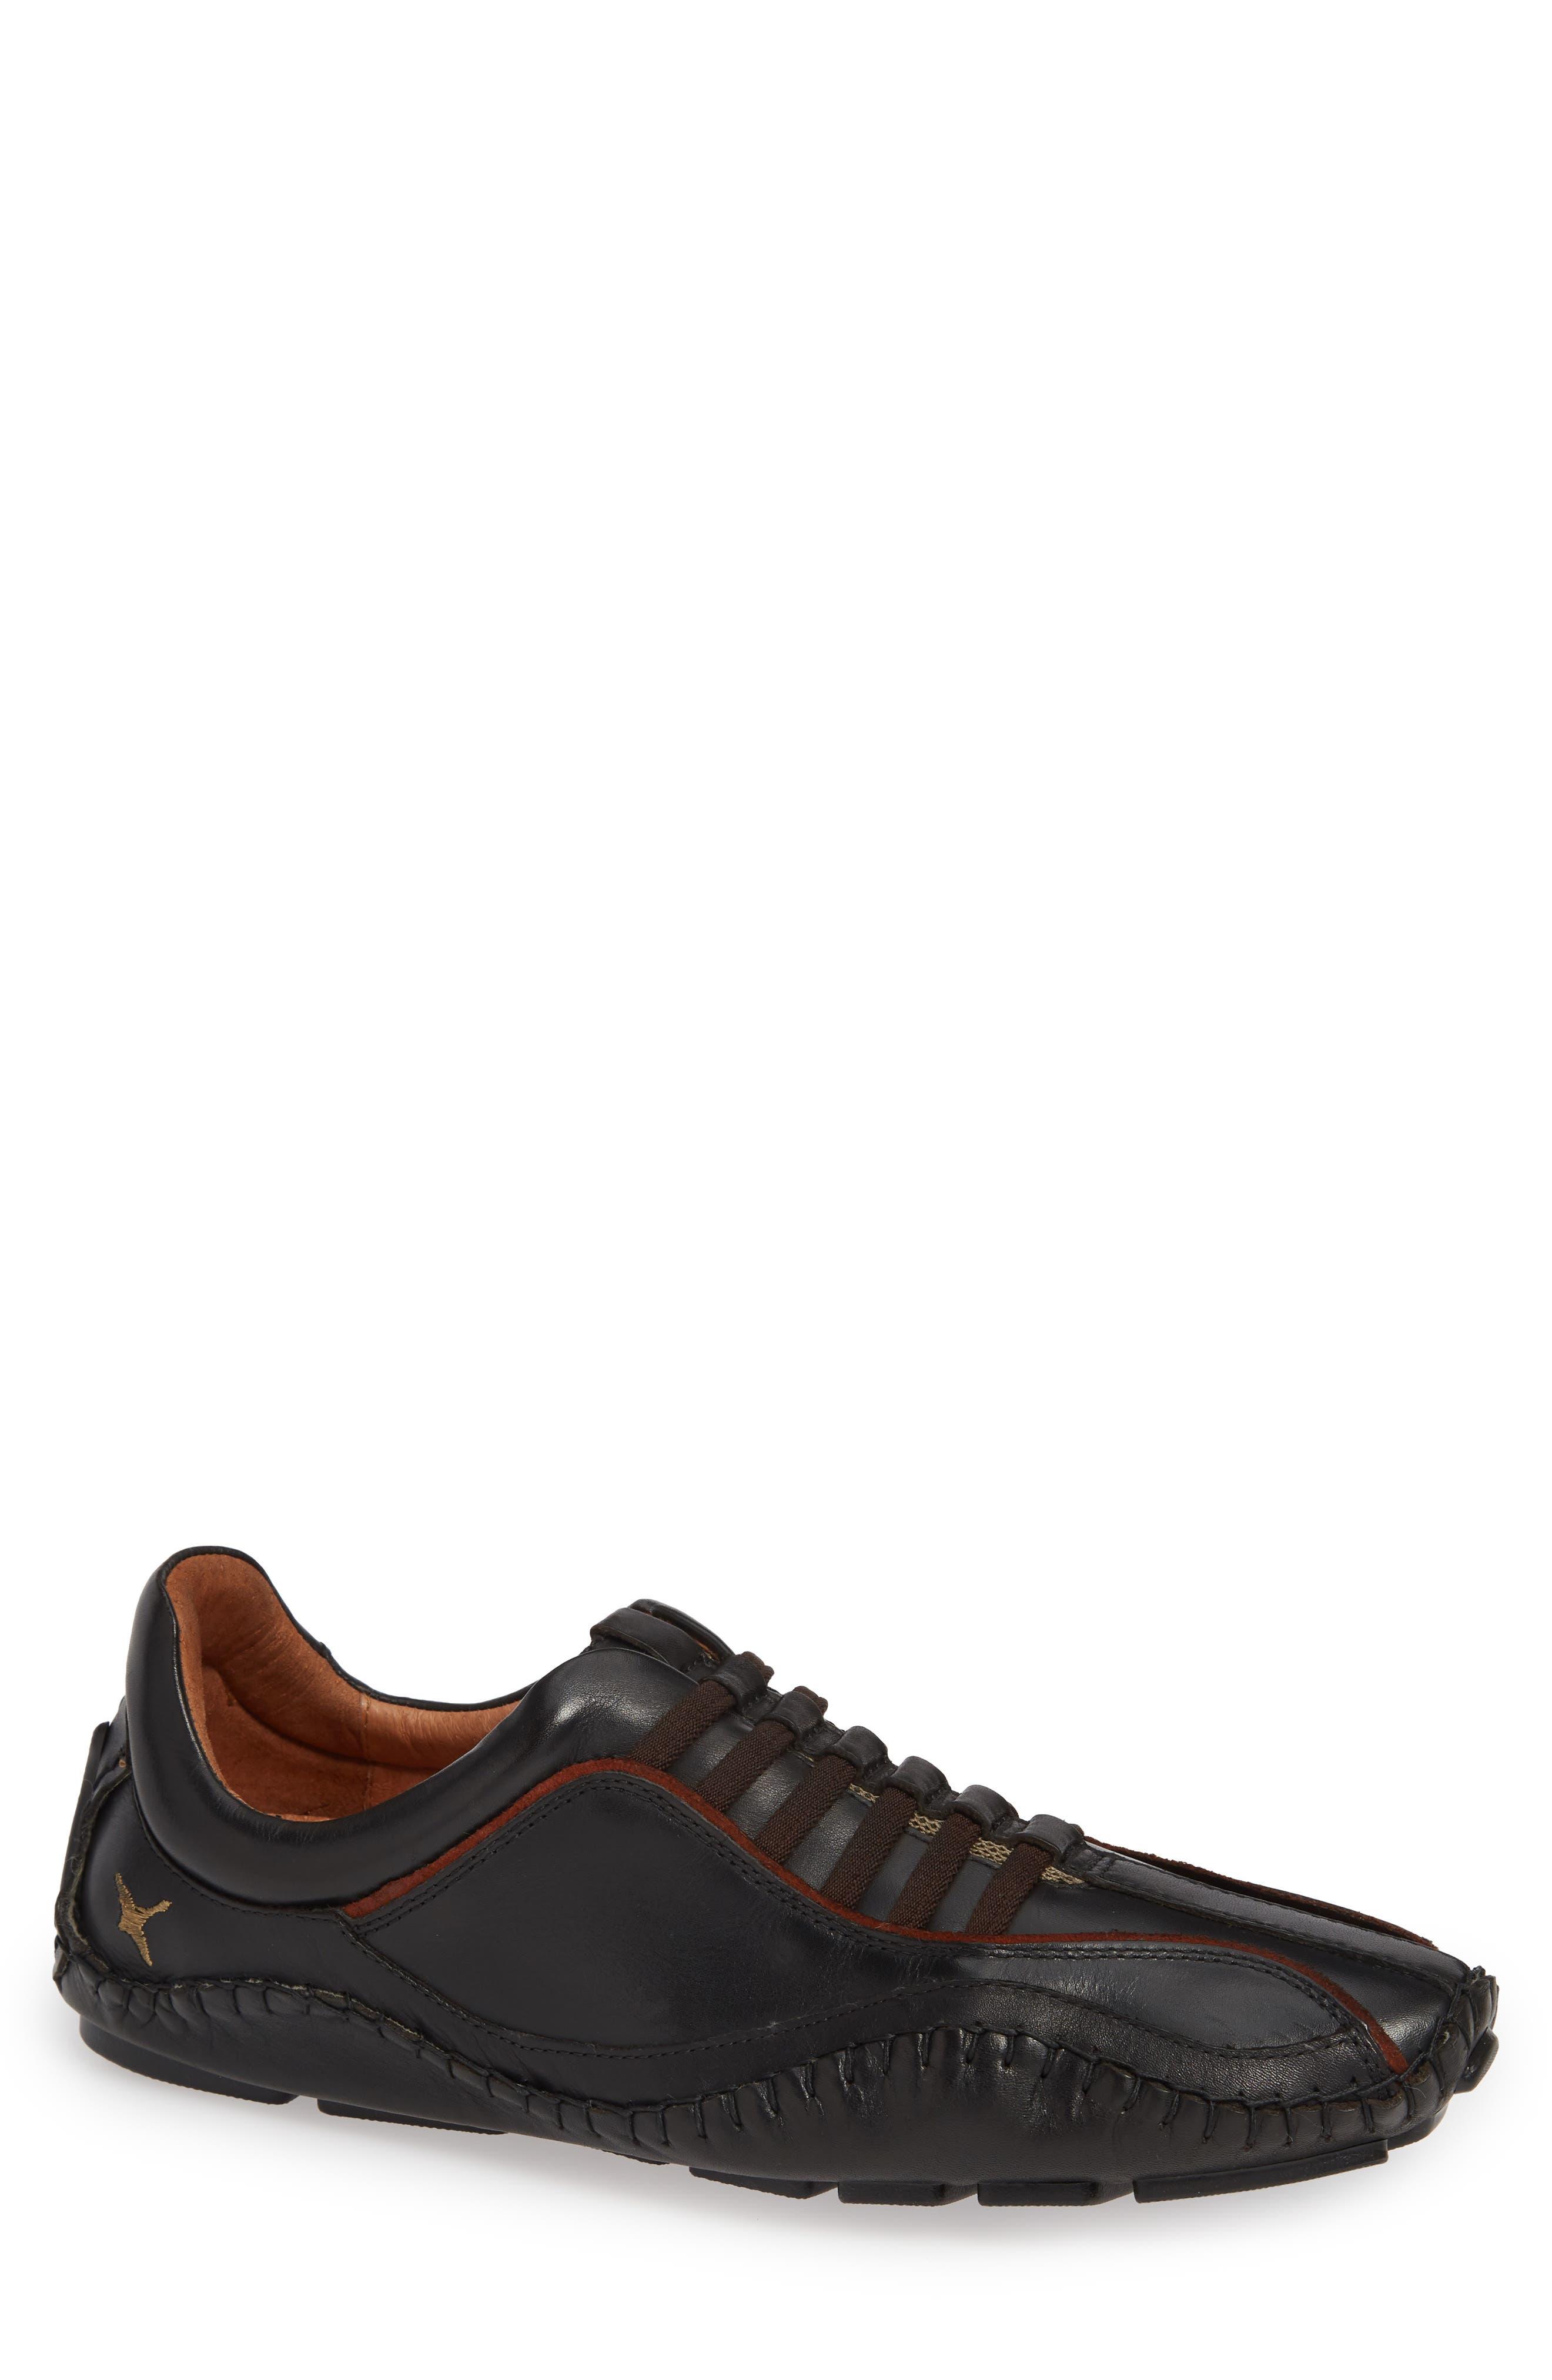 'Fuencarral' Driving Shoe,                             Main thumbnail 1, color,                             BLACK